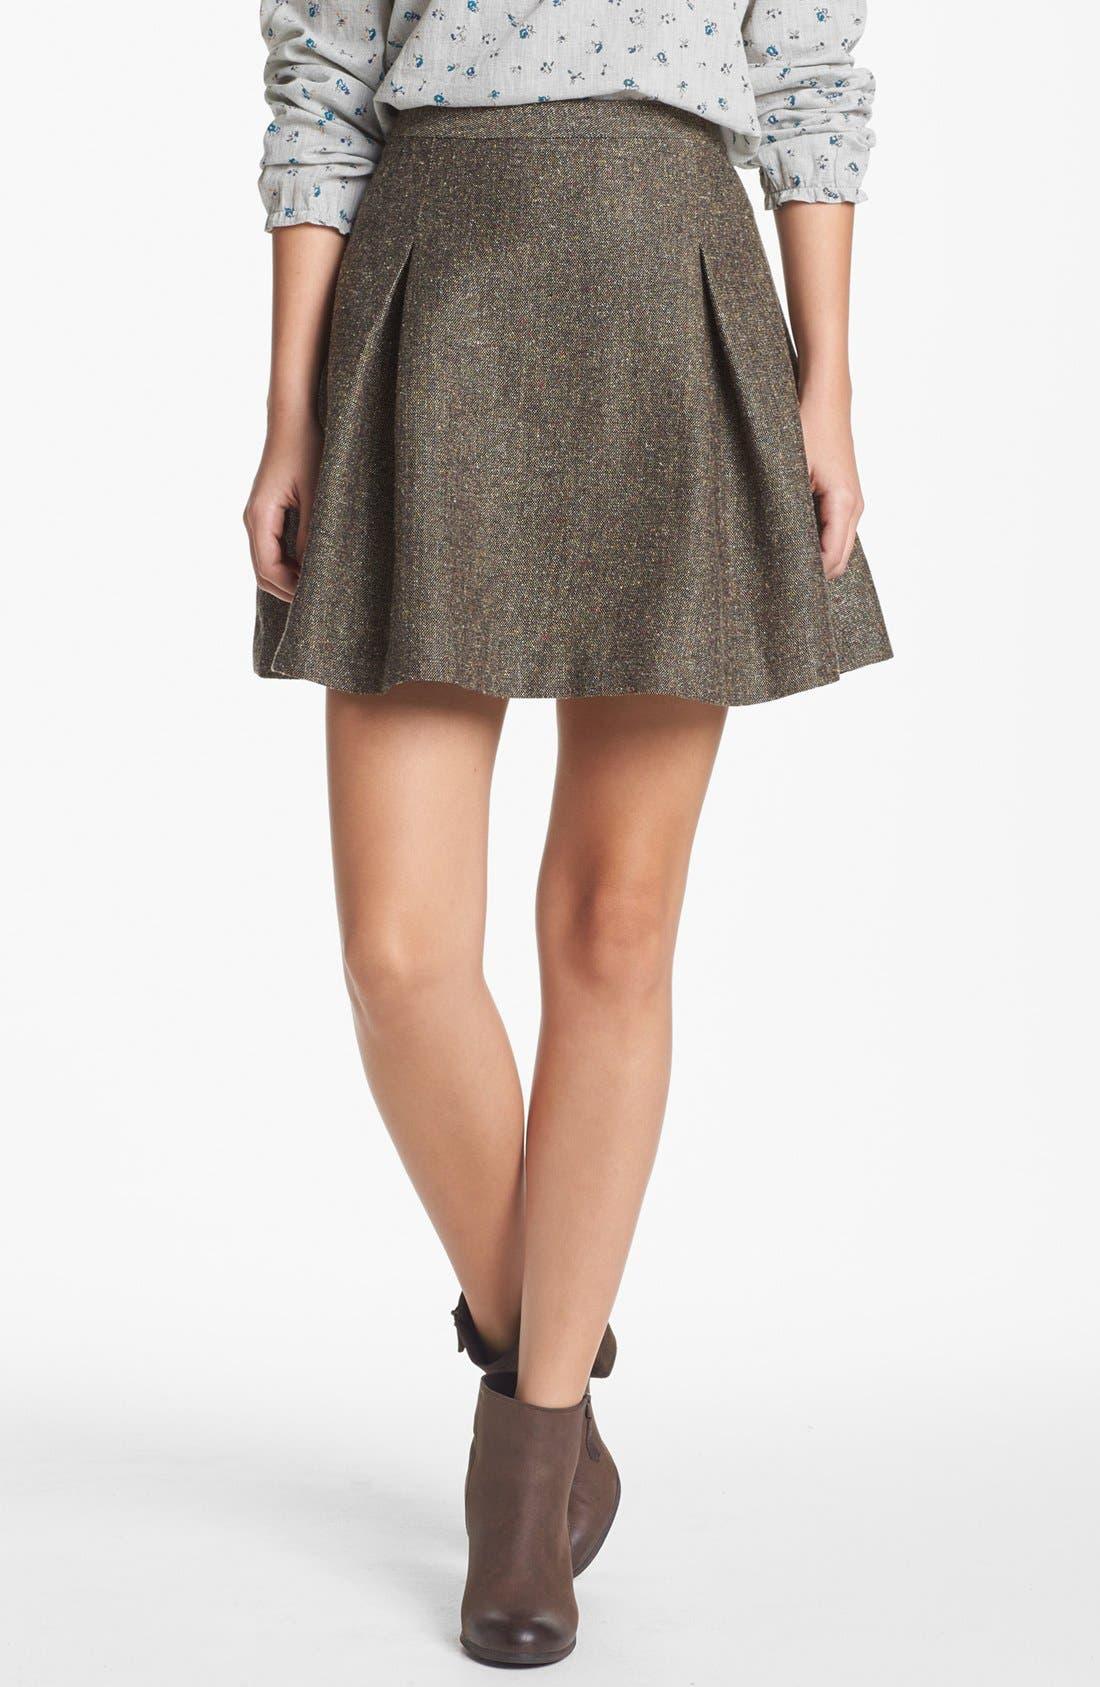 Alternate Image 1 Selected - Hinge® Metallic Tweed Skater Skirt